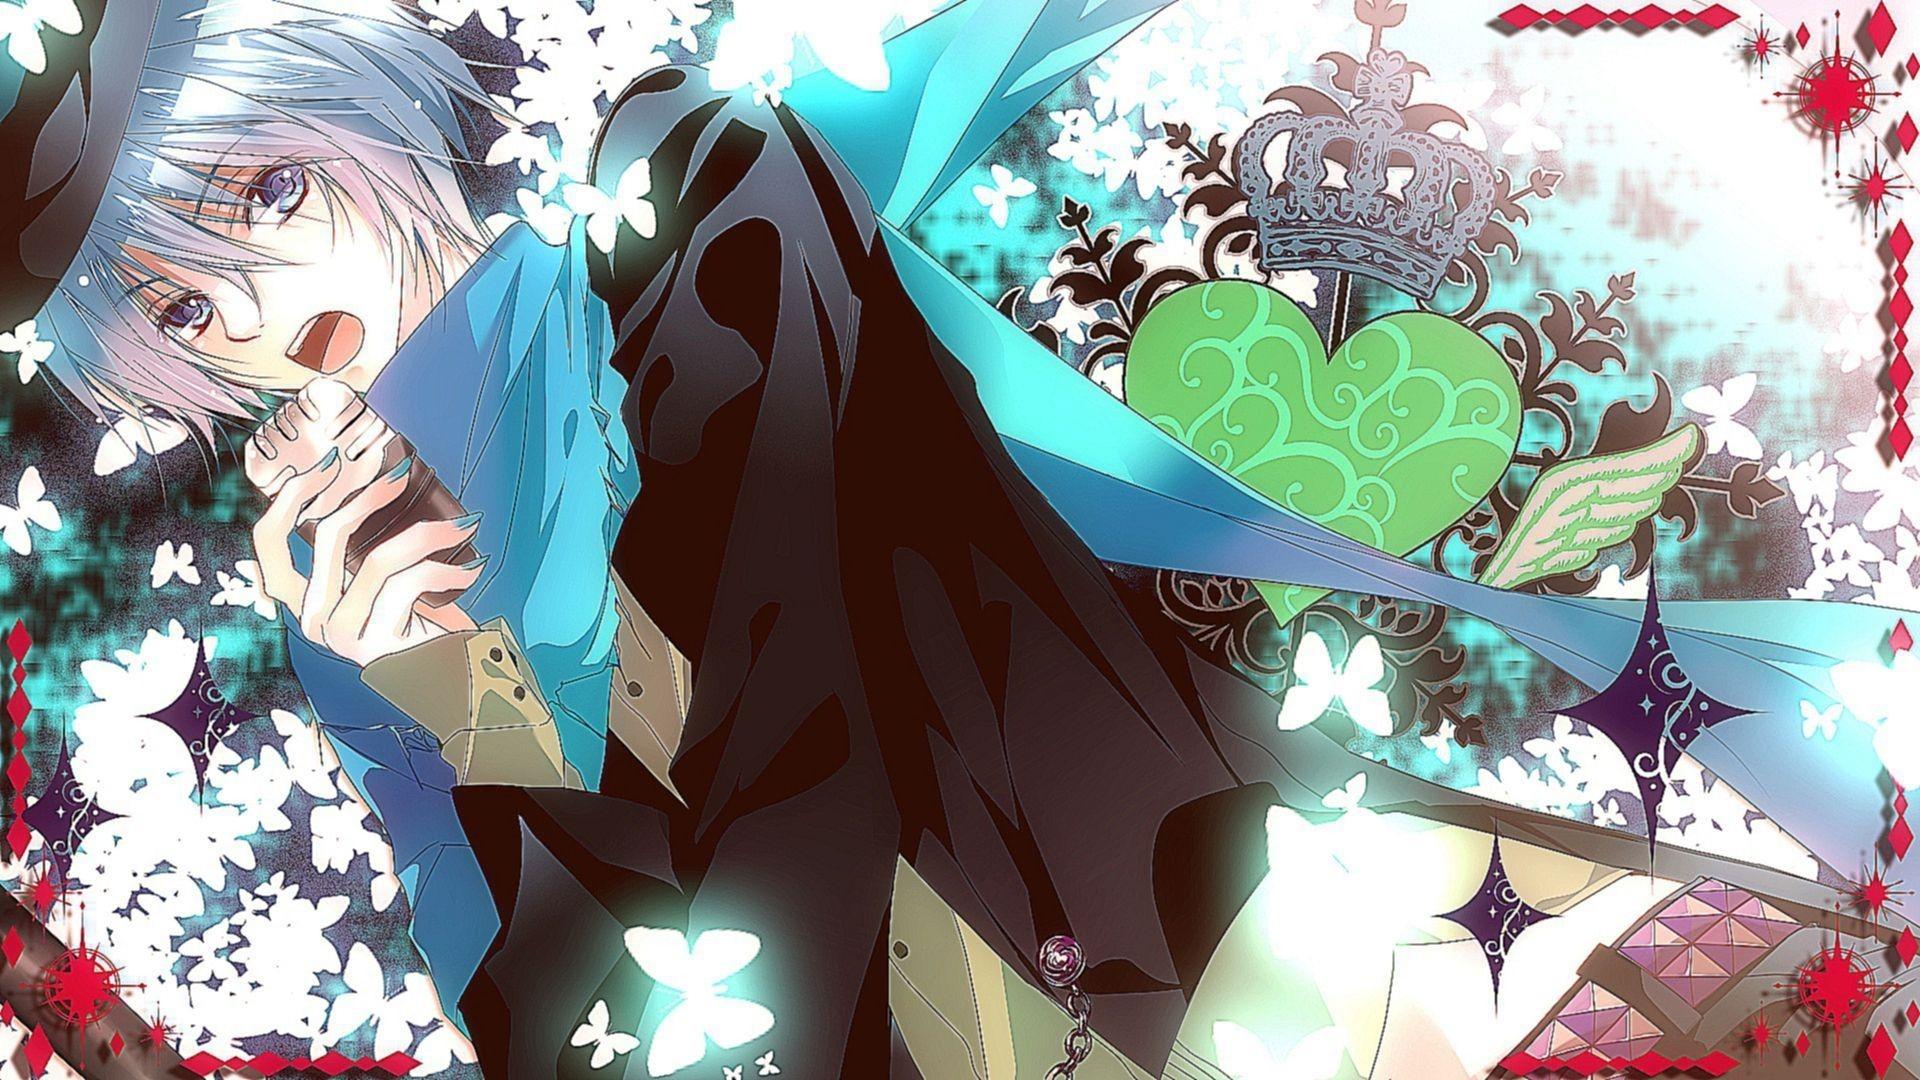 Handsome Anime Boy wallpaper